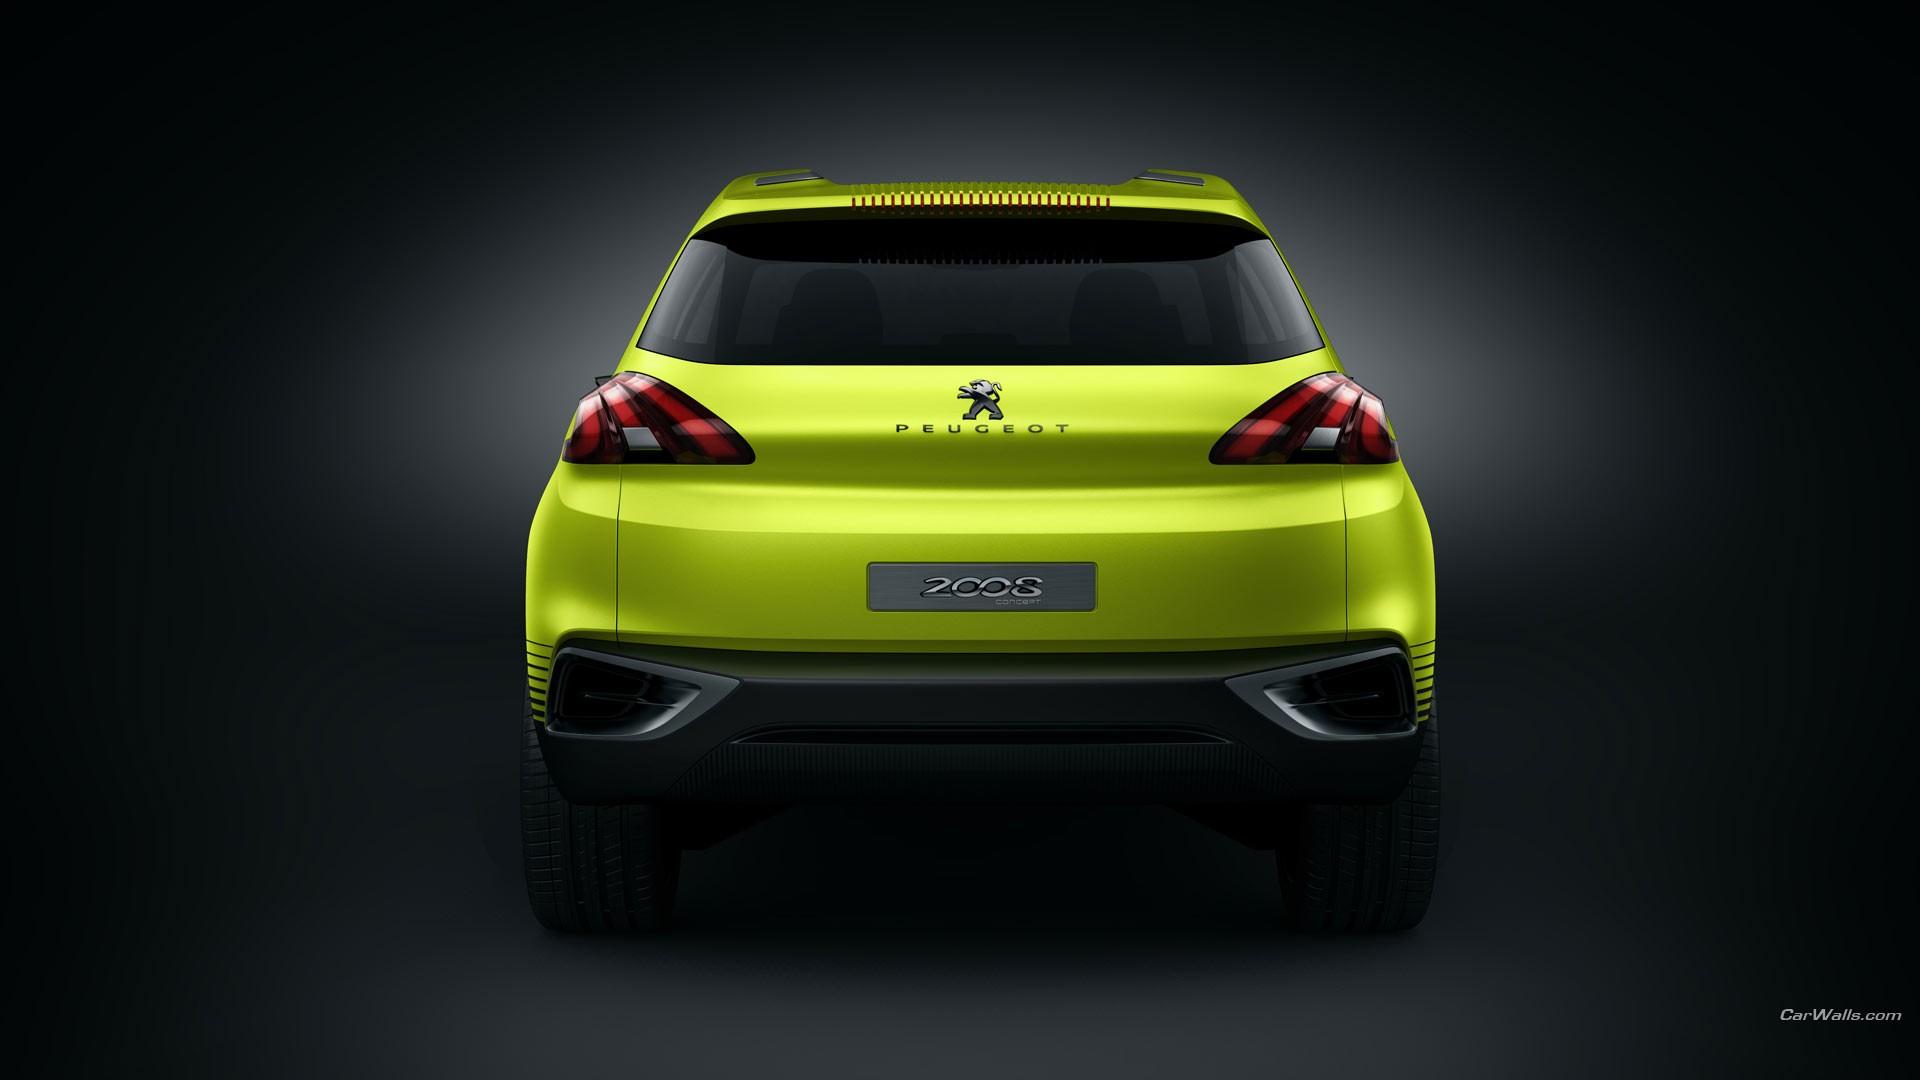 Wallpaper : concept cars, sports car, Volkswagen Scirocco, Honda CR ...